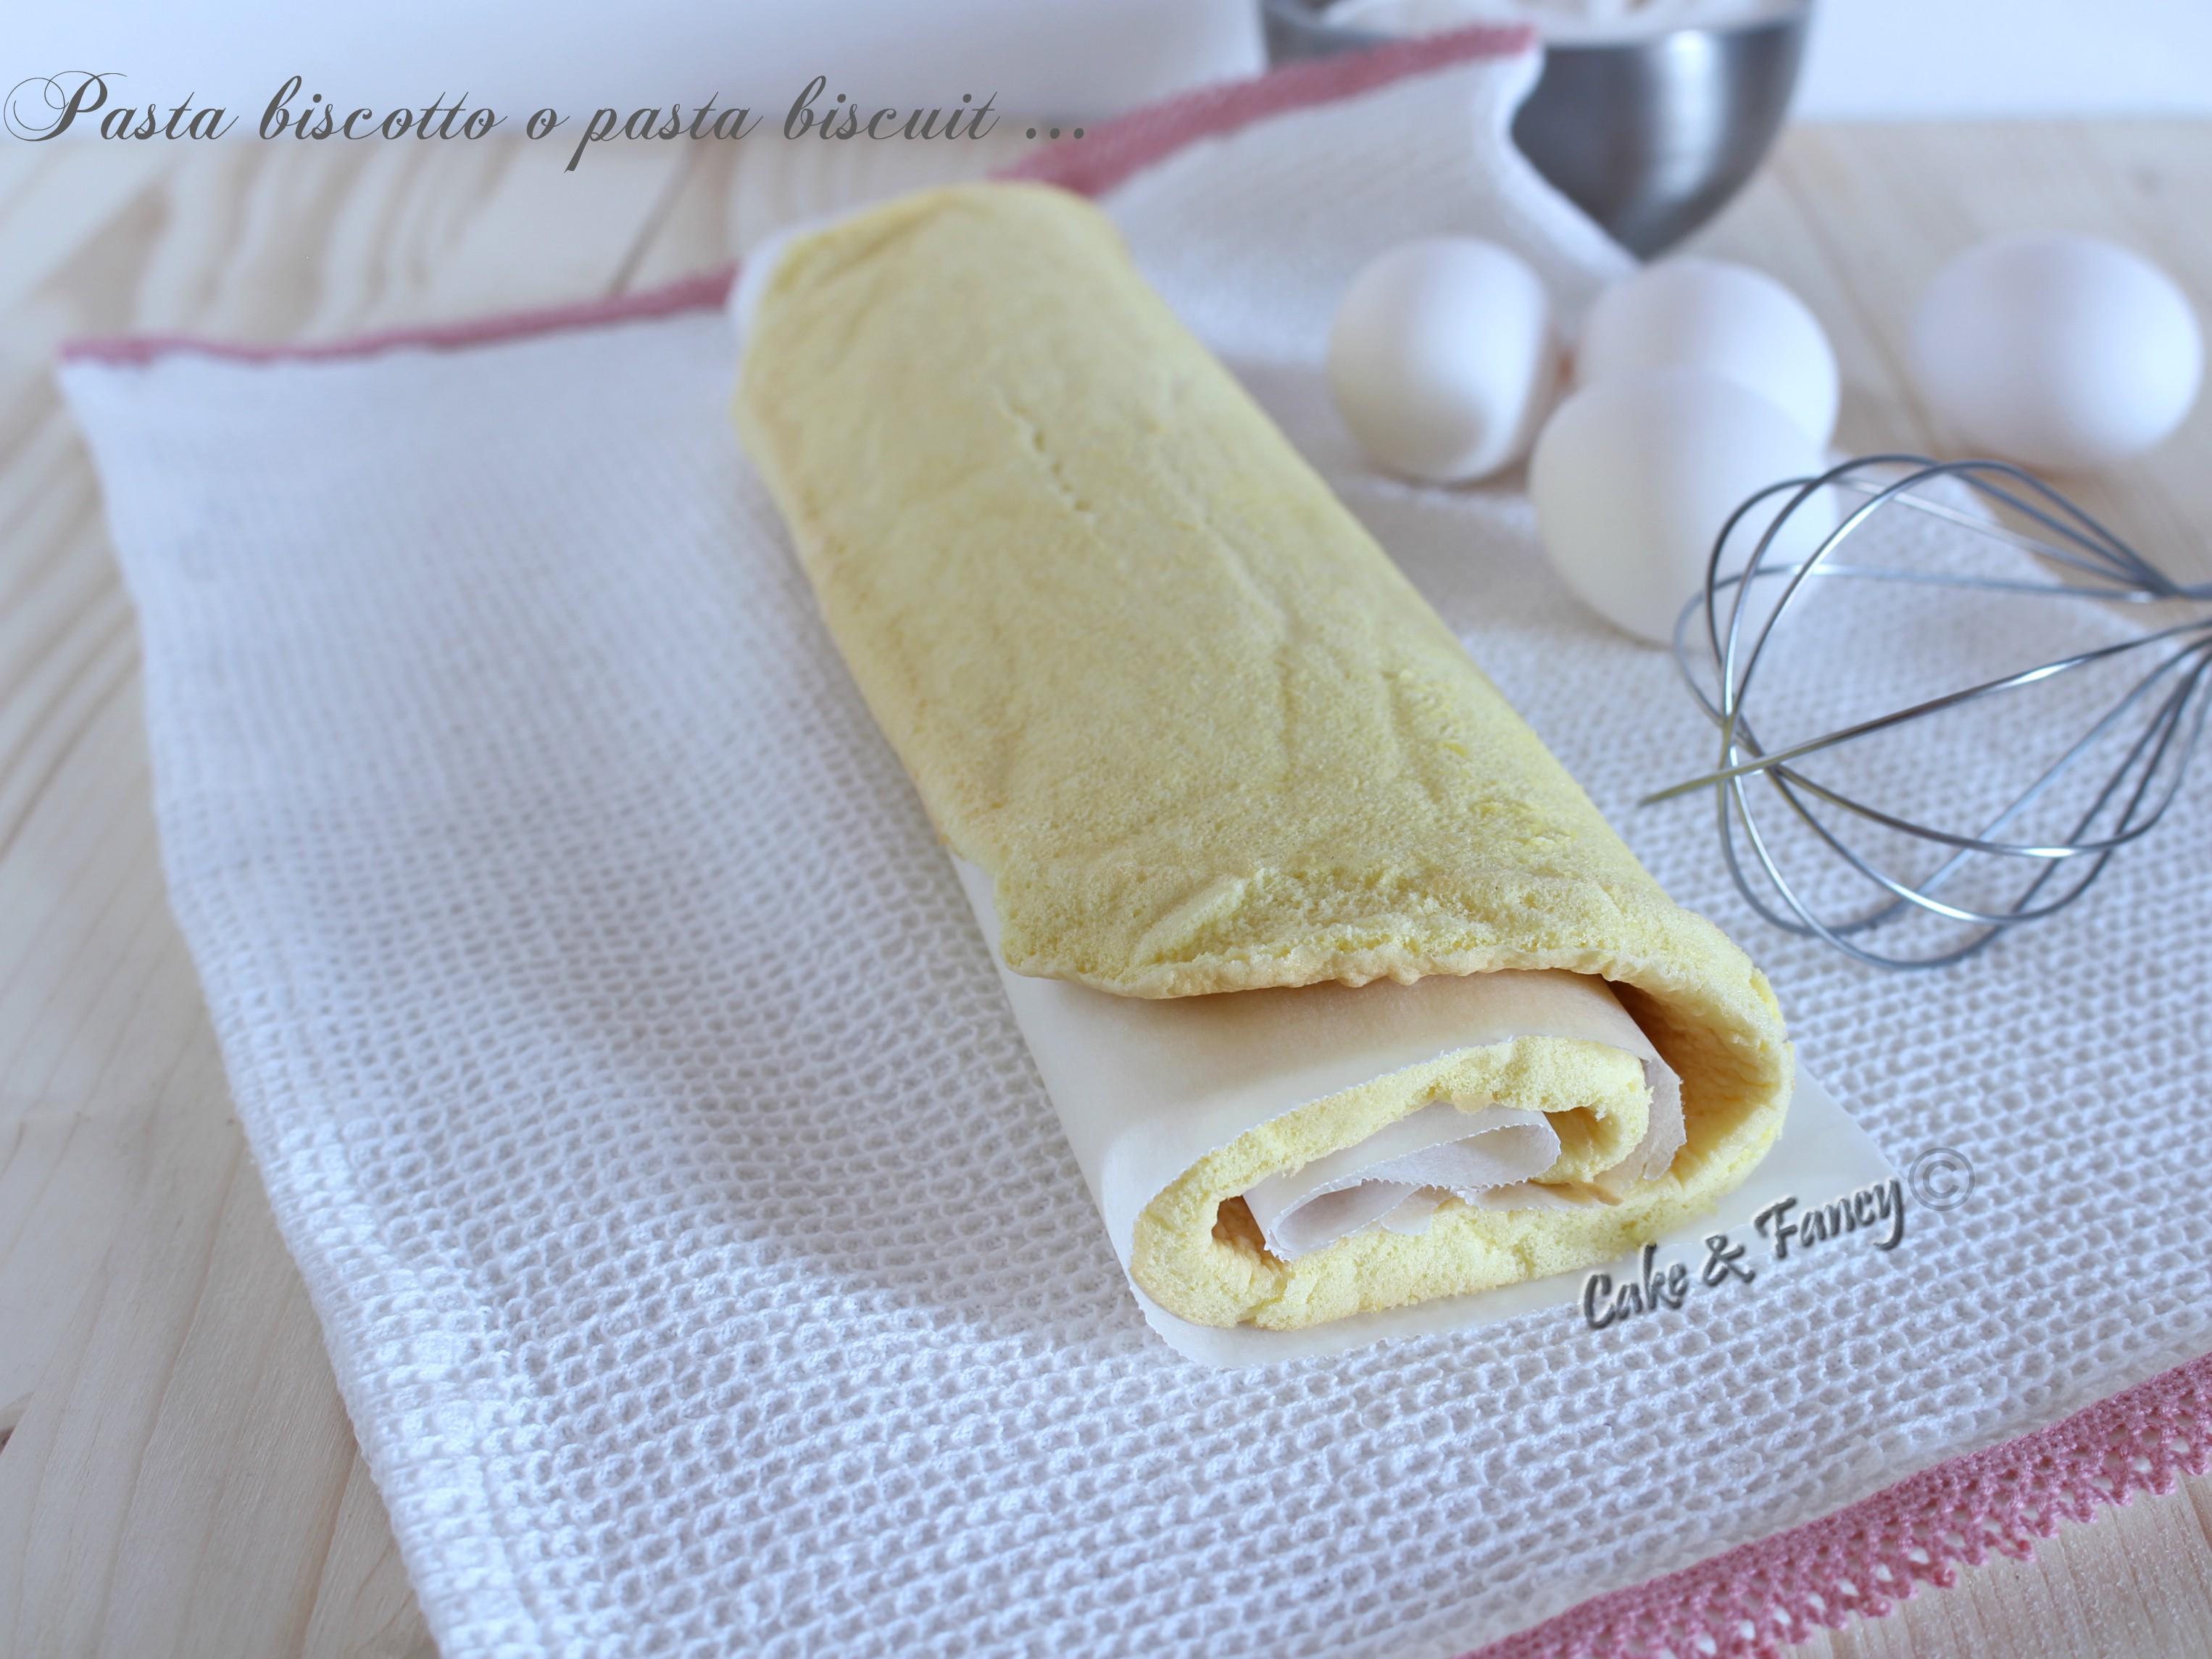 Pasta biscotto o pasta biscuit